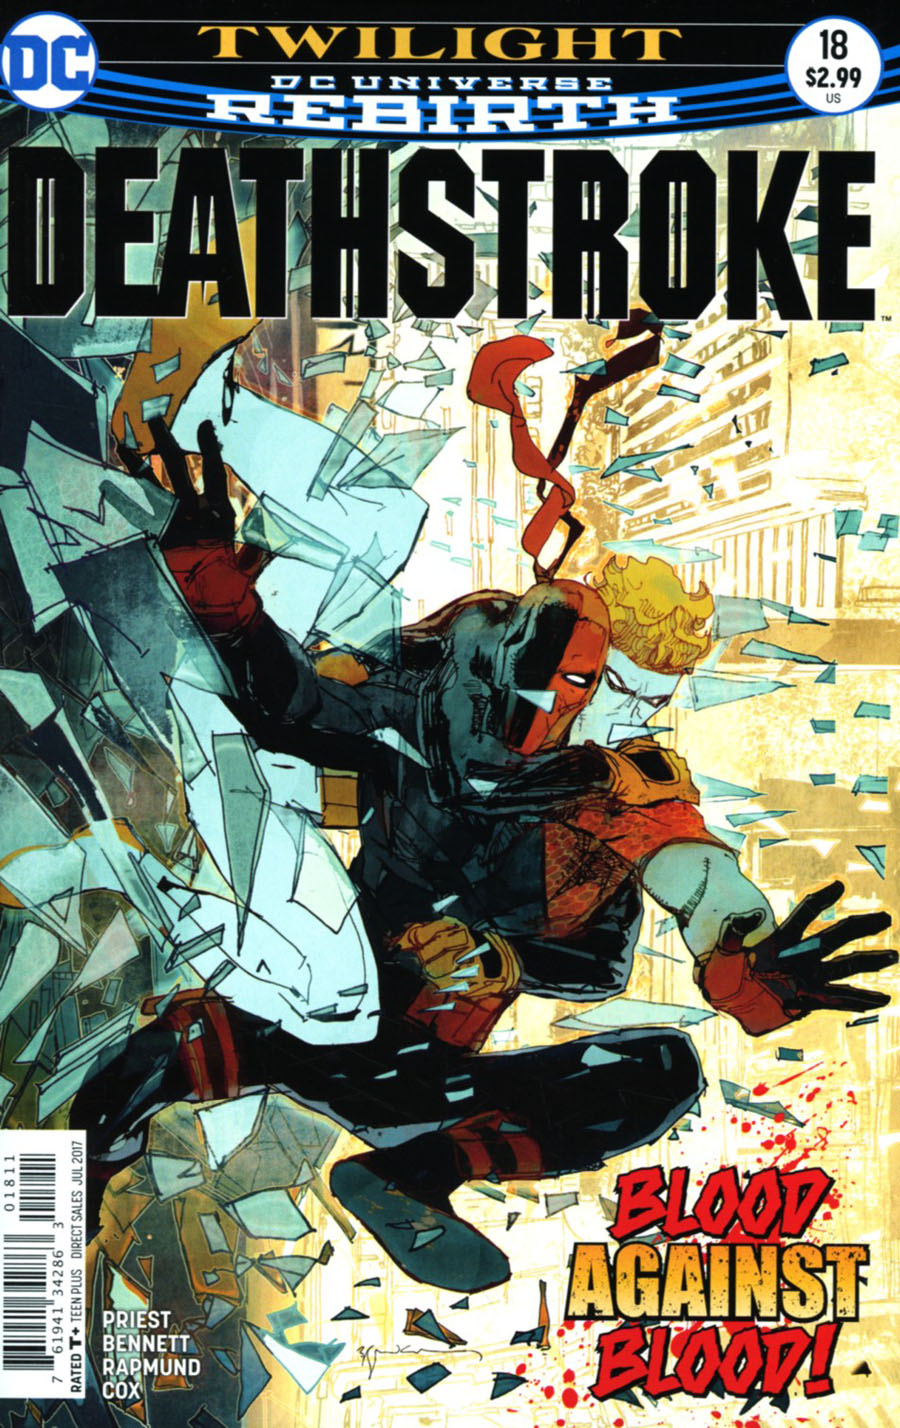 Deathstroke Vol 4 #18 Cover A Regular Bill Sienkiewicz Cover